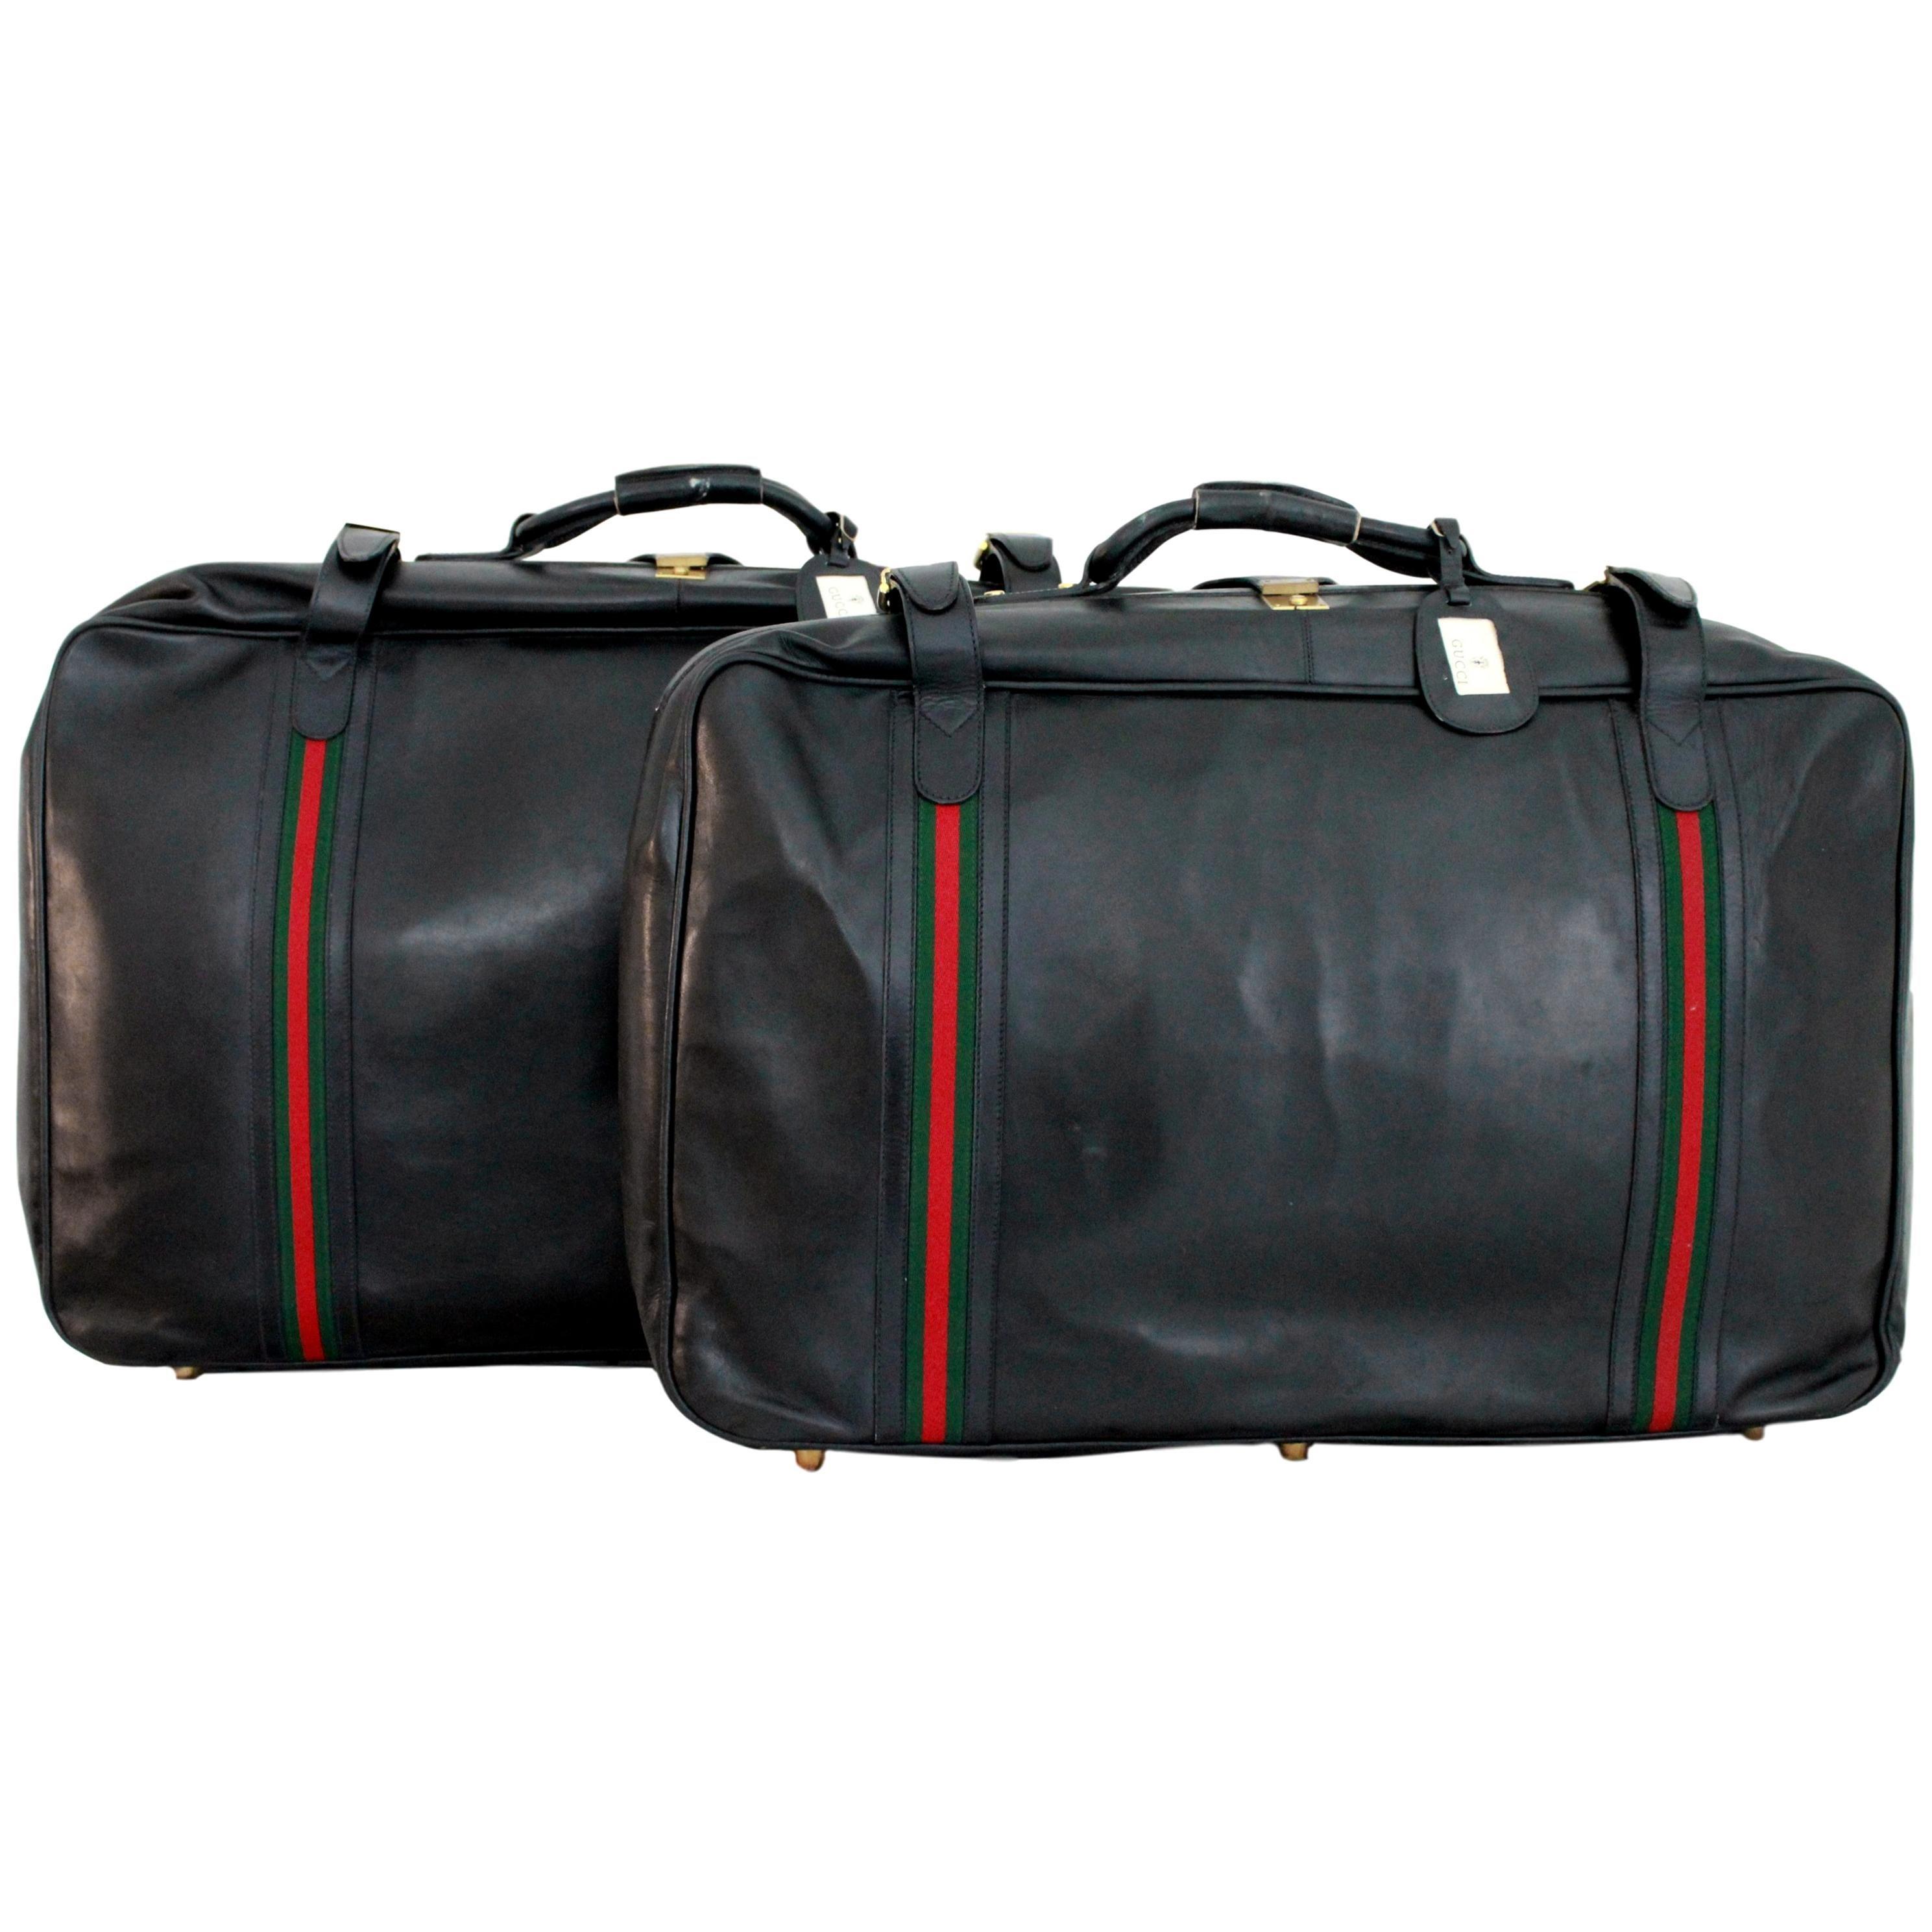 c4a77880dfde Vintage Gucci Handbags and Purses - 2